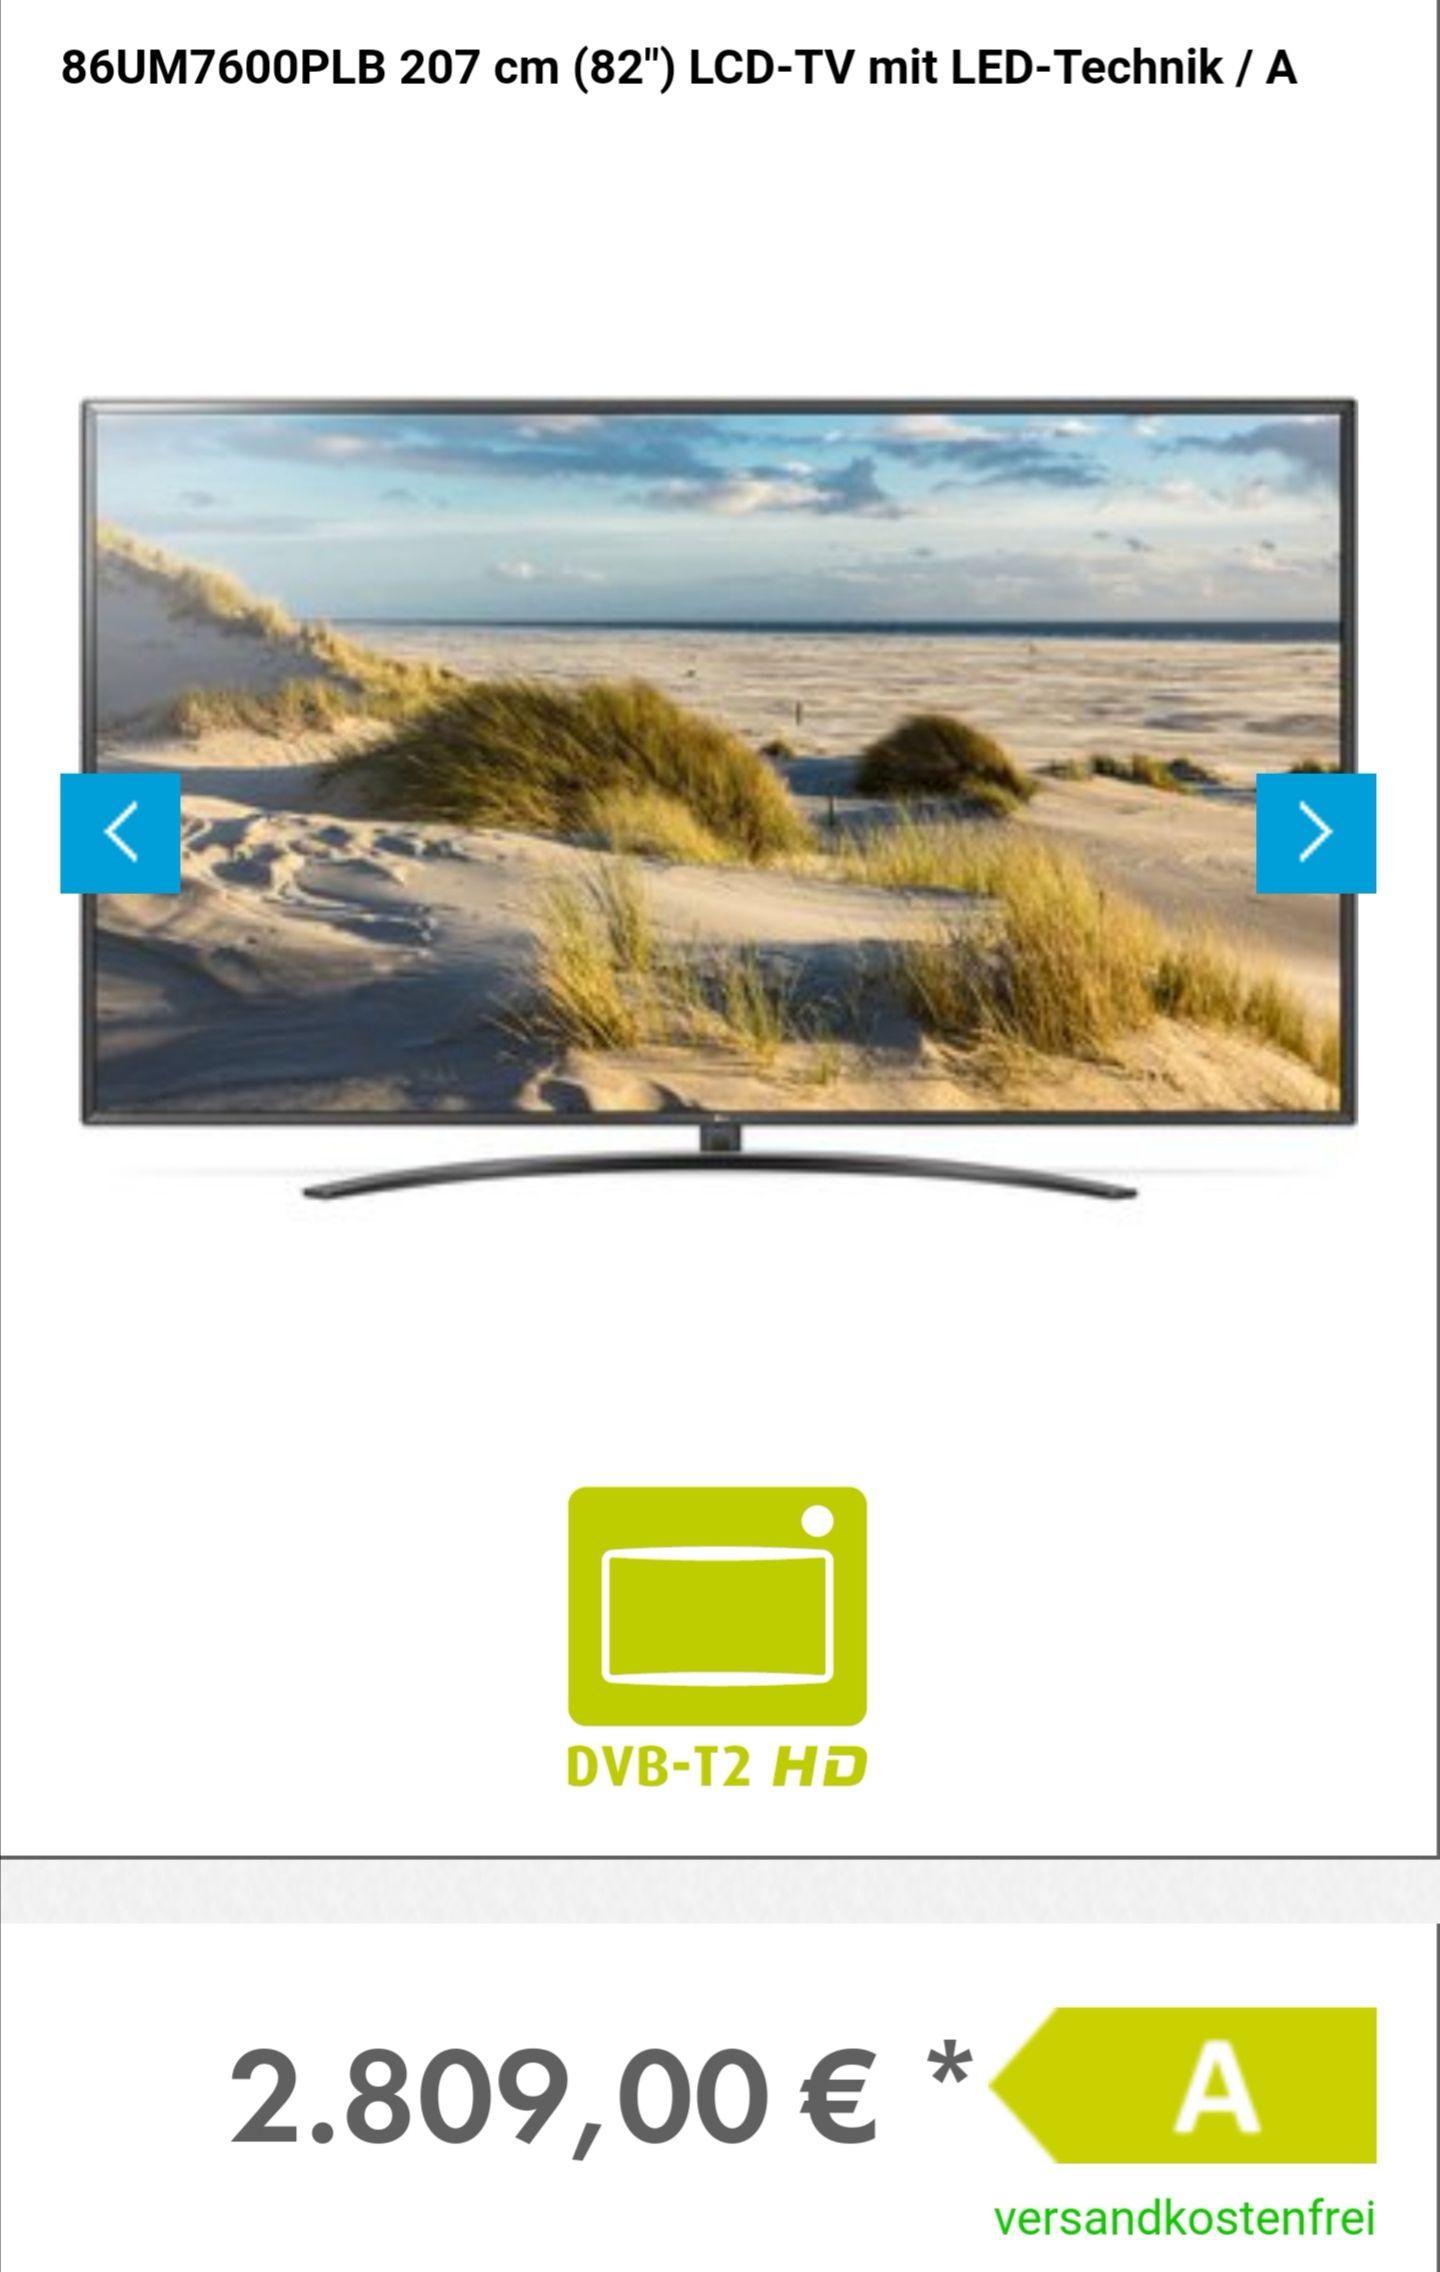 LG 86UM7600PLB UHD TV, 217 CM (86 ZOLL), UHD 4K, SMART TV, SMART TV, TM200 (100HZ), DVB-T2 HD, DVB-C, DVB-S, DVB-S2